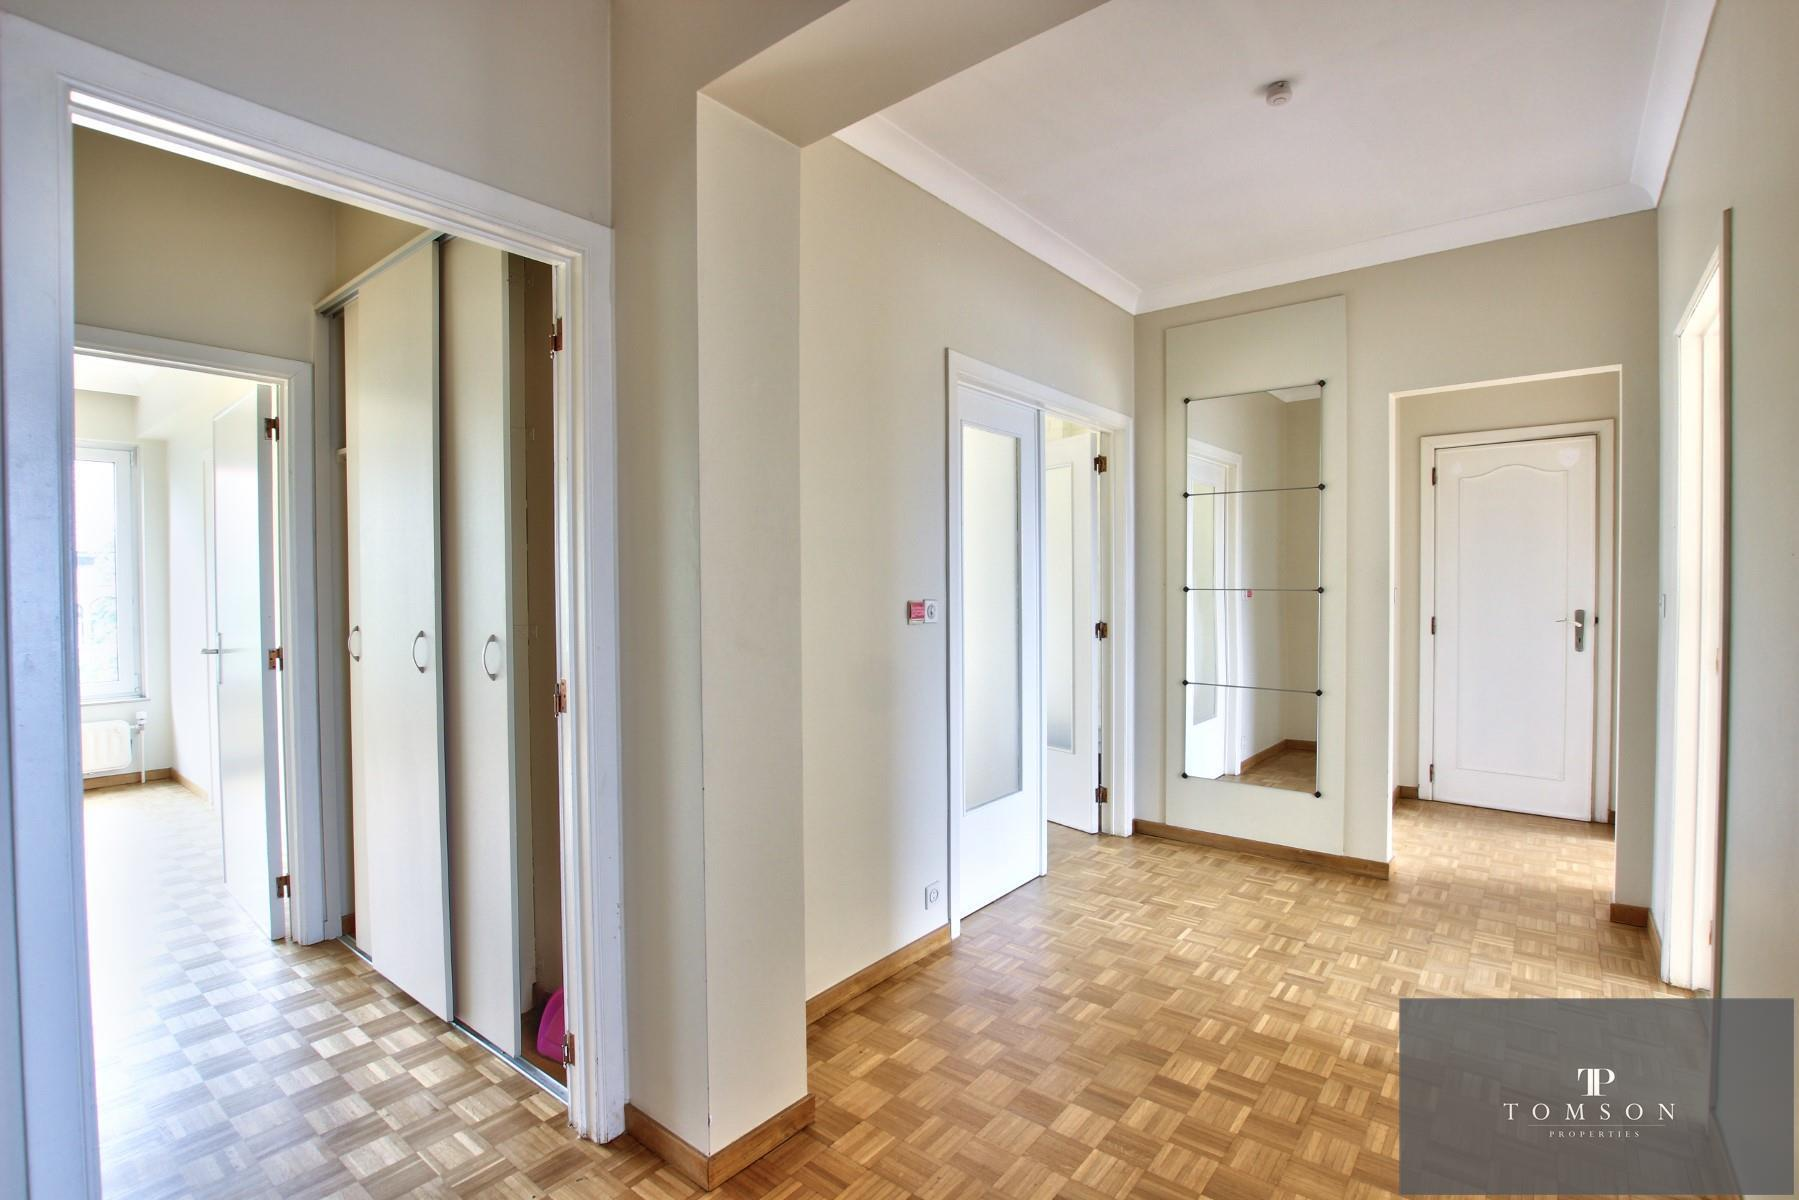 Flat - Etterbeek - #4496041-9